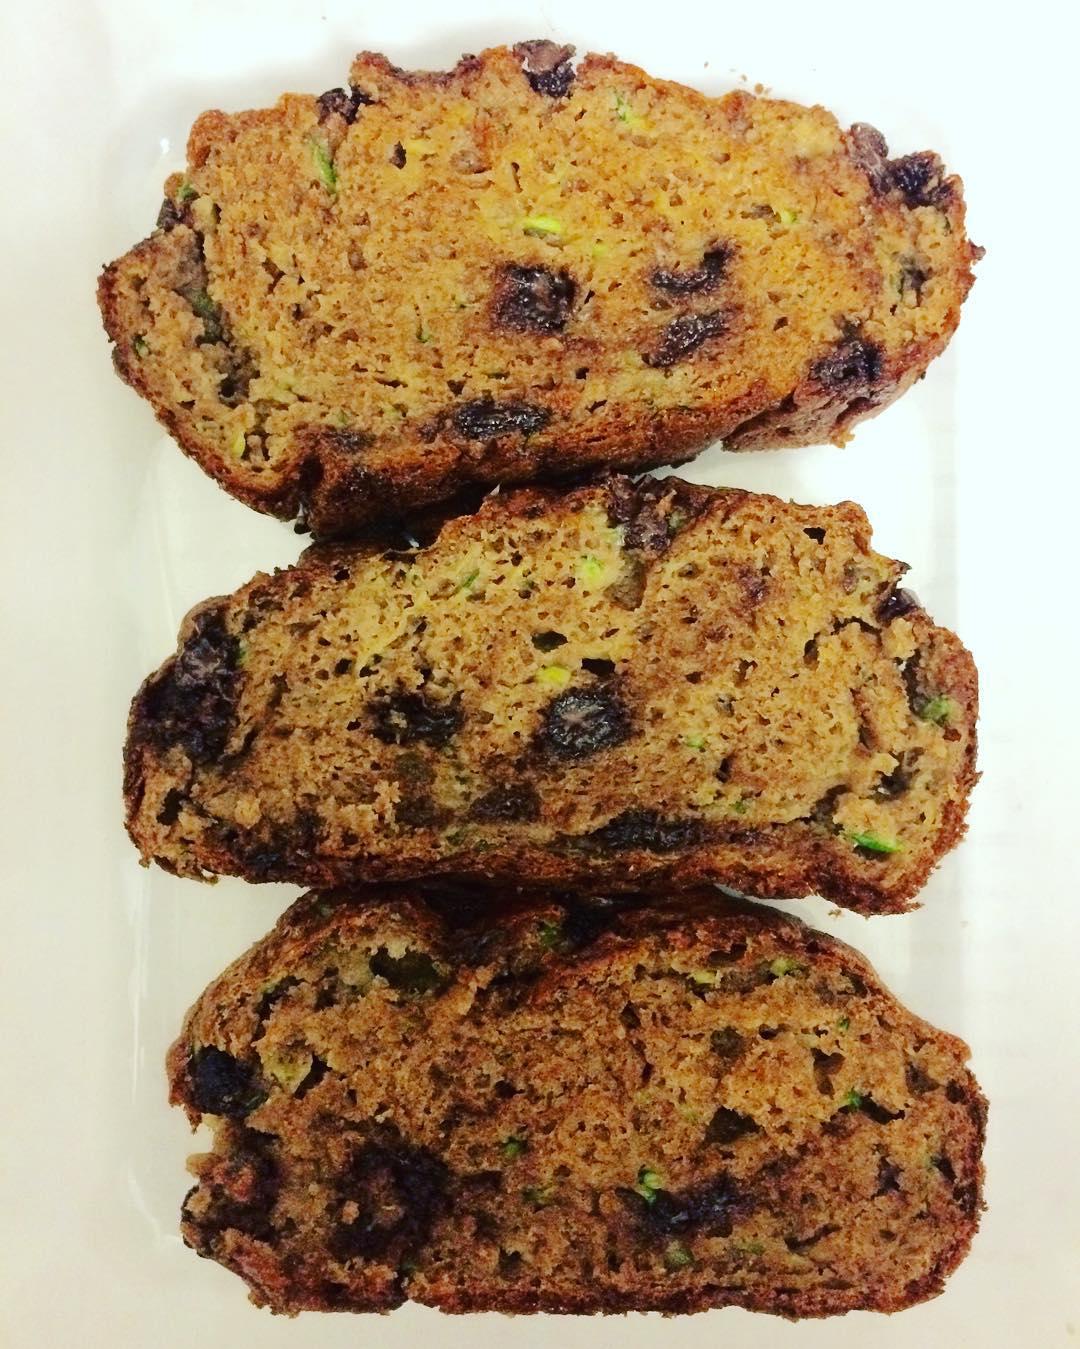 Whole Wheat Chocolate Chip Zucchini Bread | @natspics82